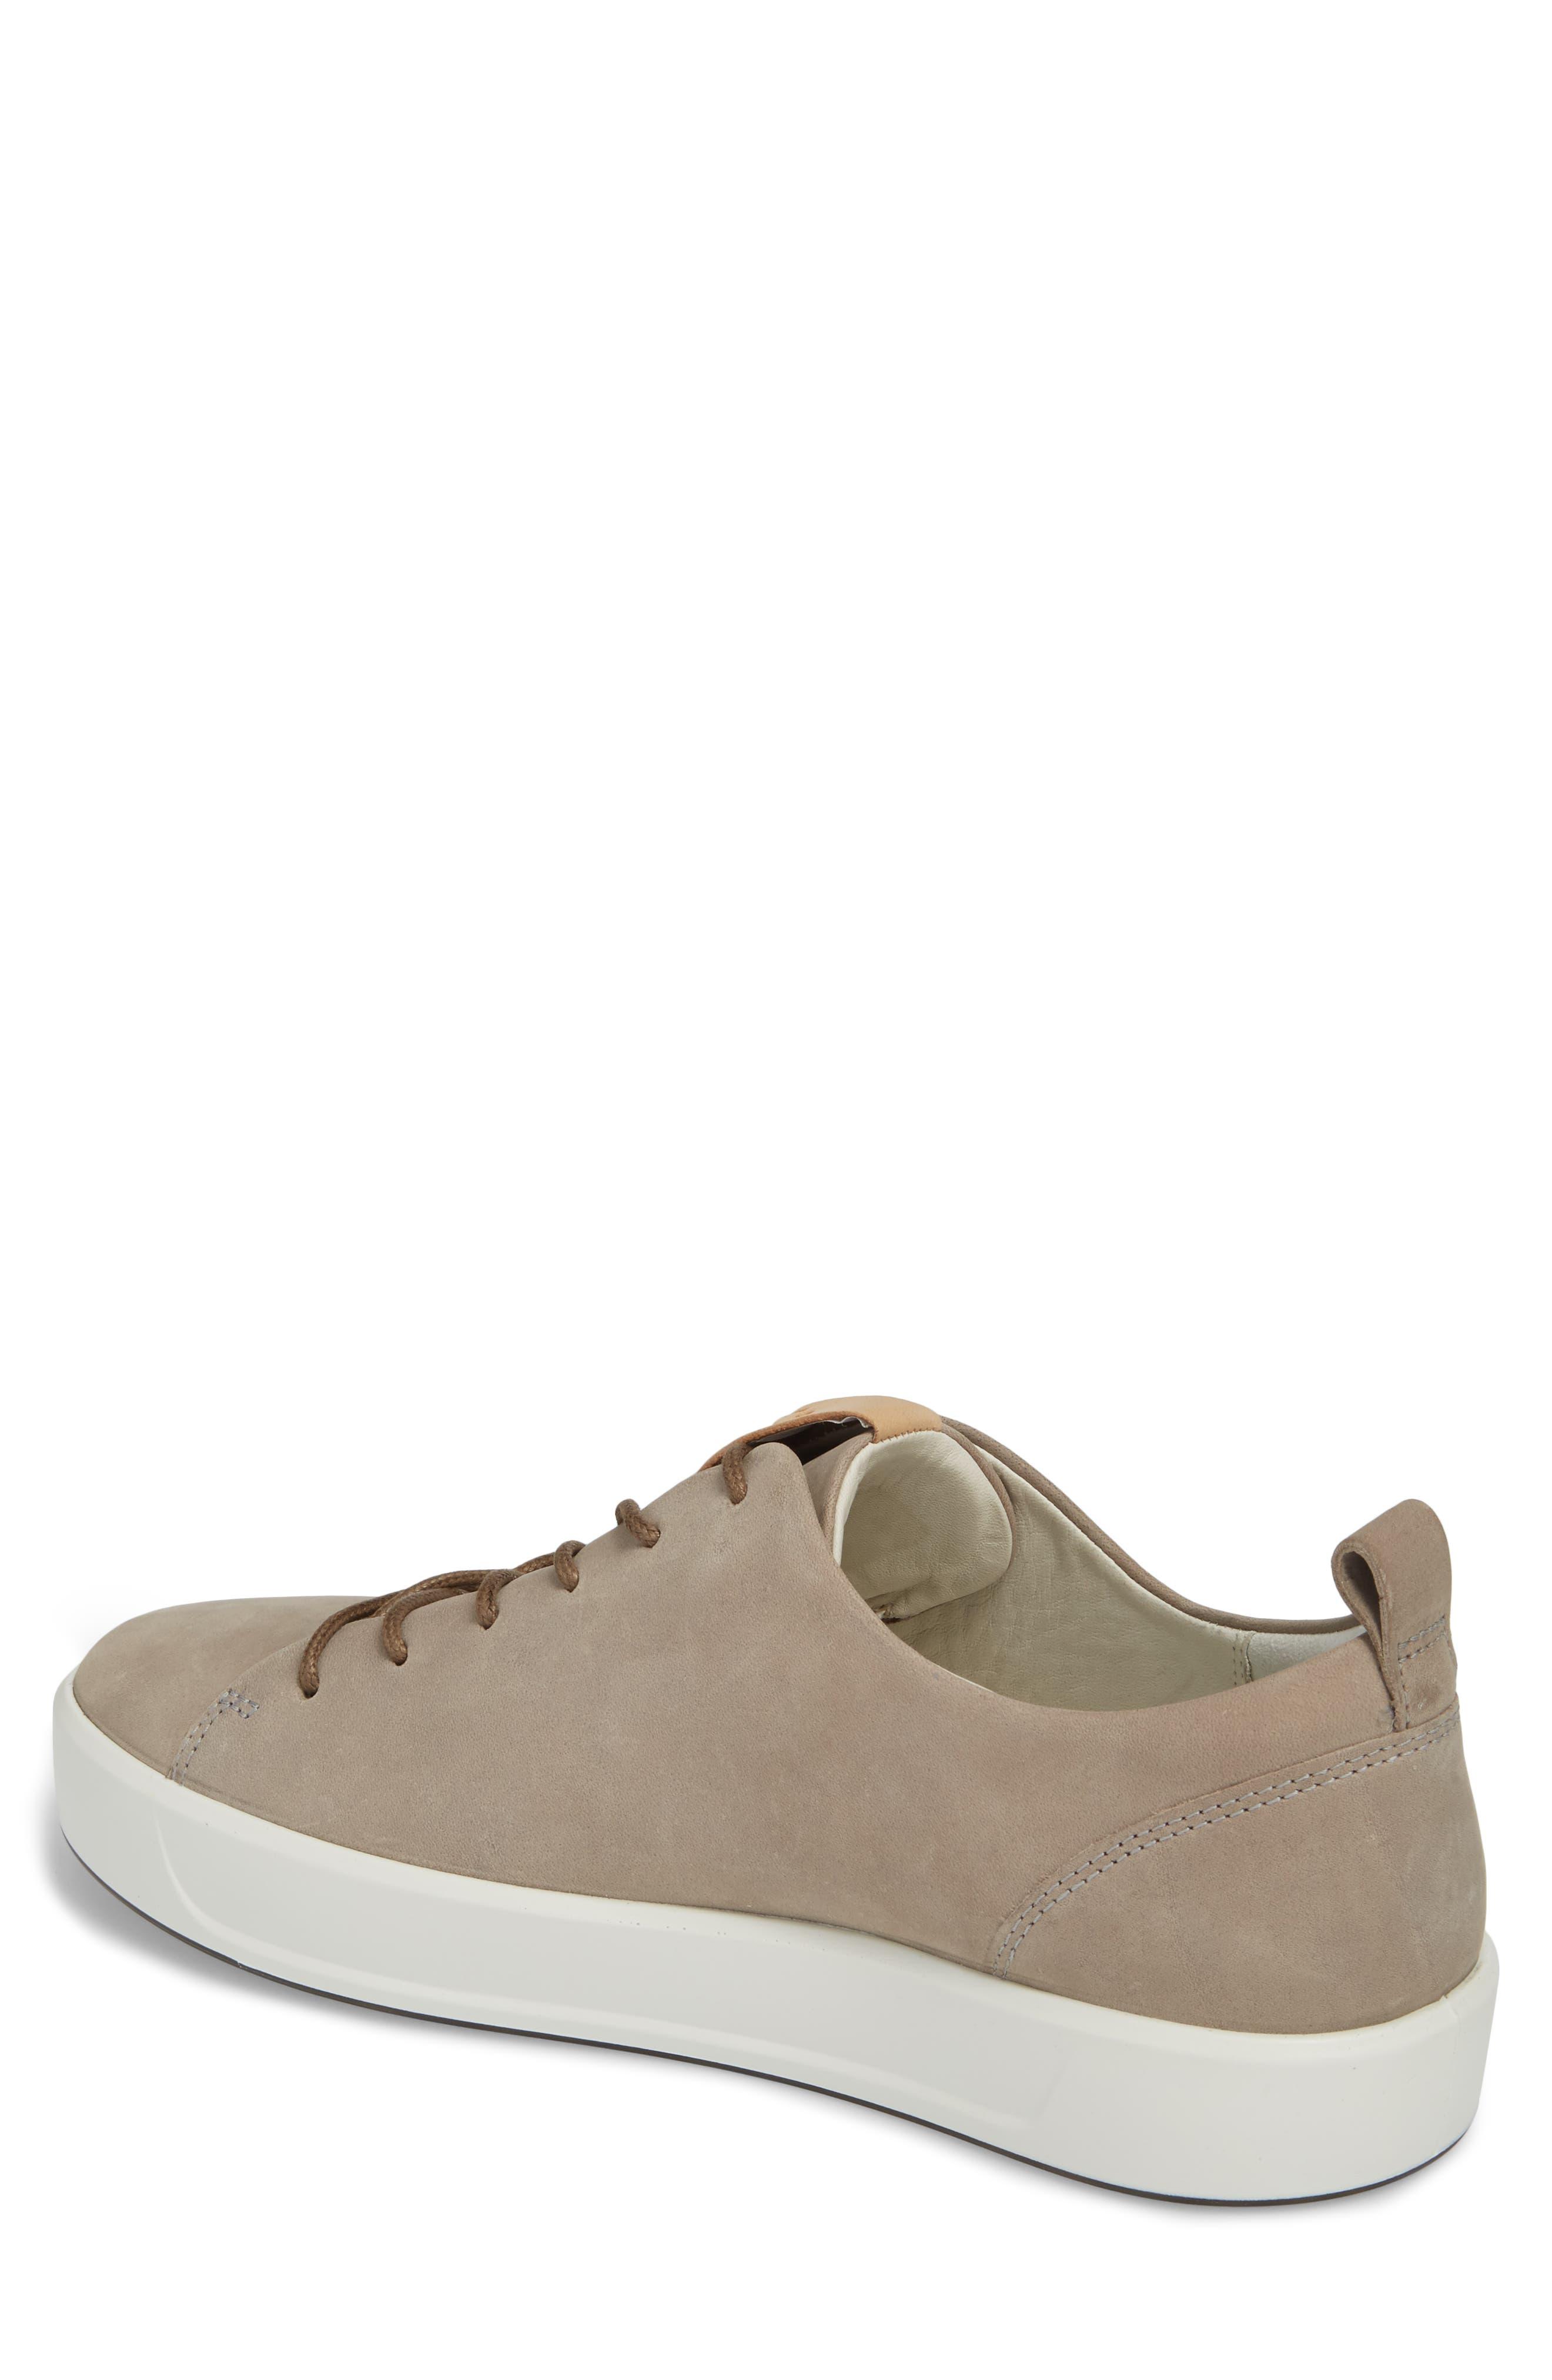 ECCO, Soft 8 Sneaker, Alternate thumbnail 2, color, MOONROCK